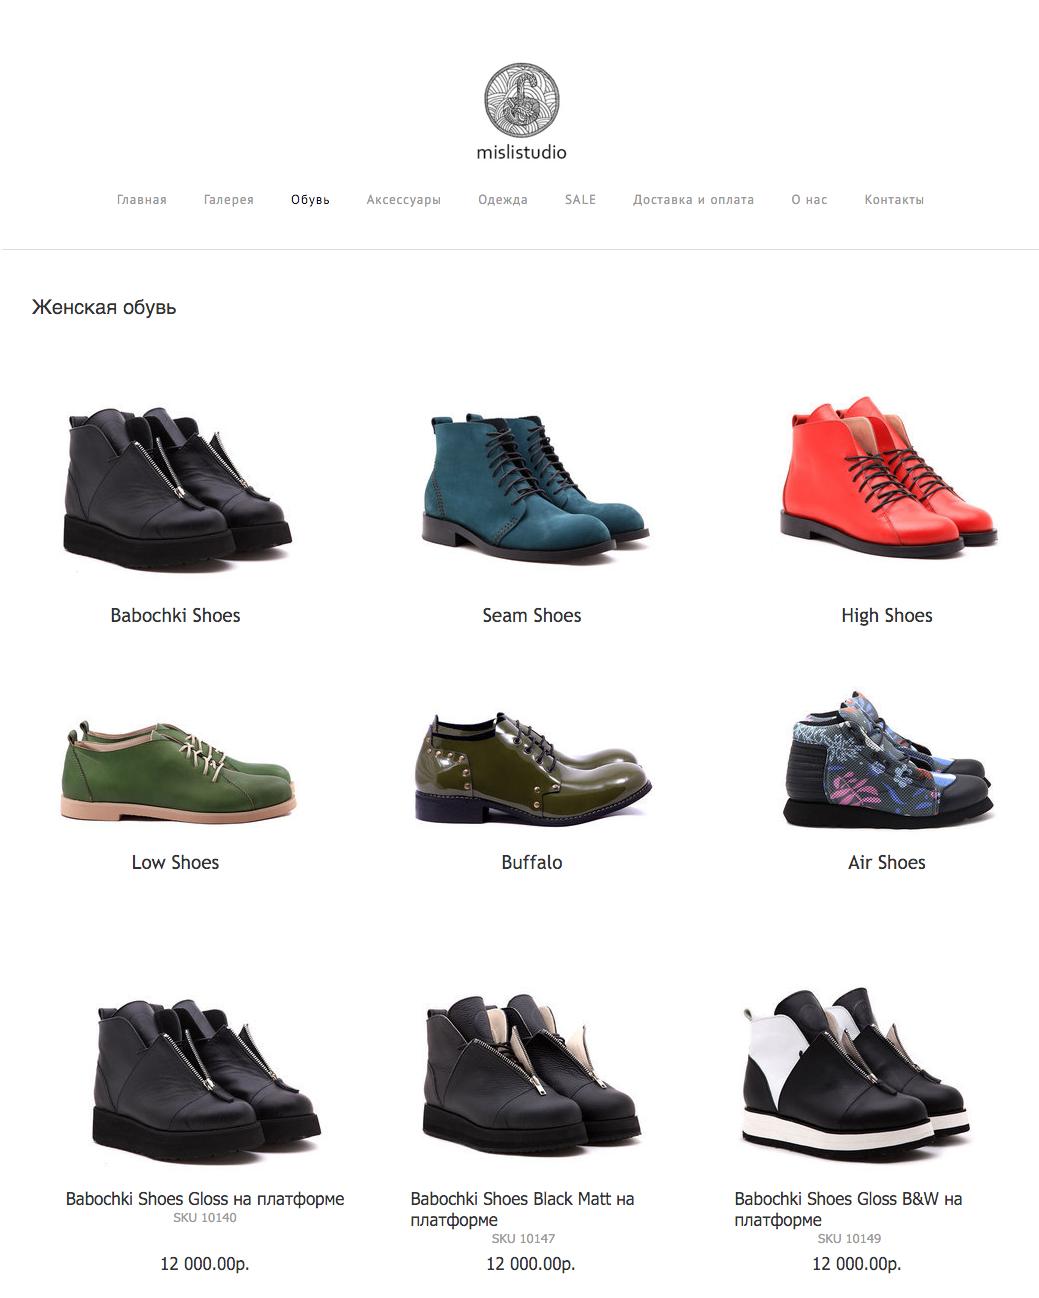 Online store mislistudio